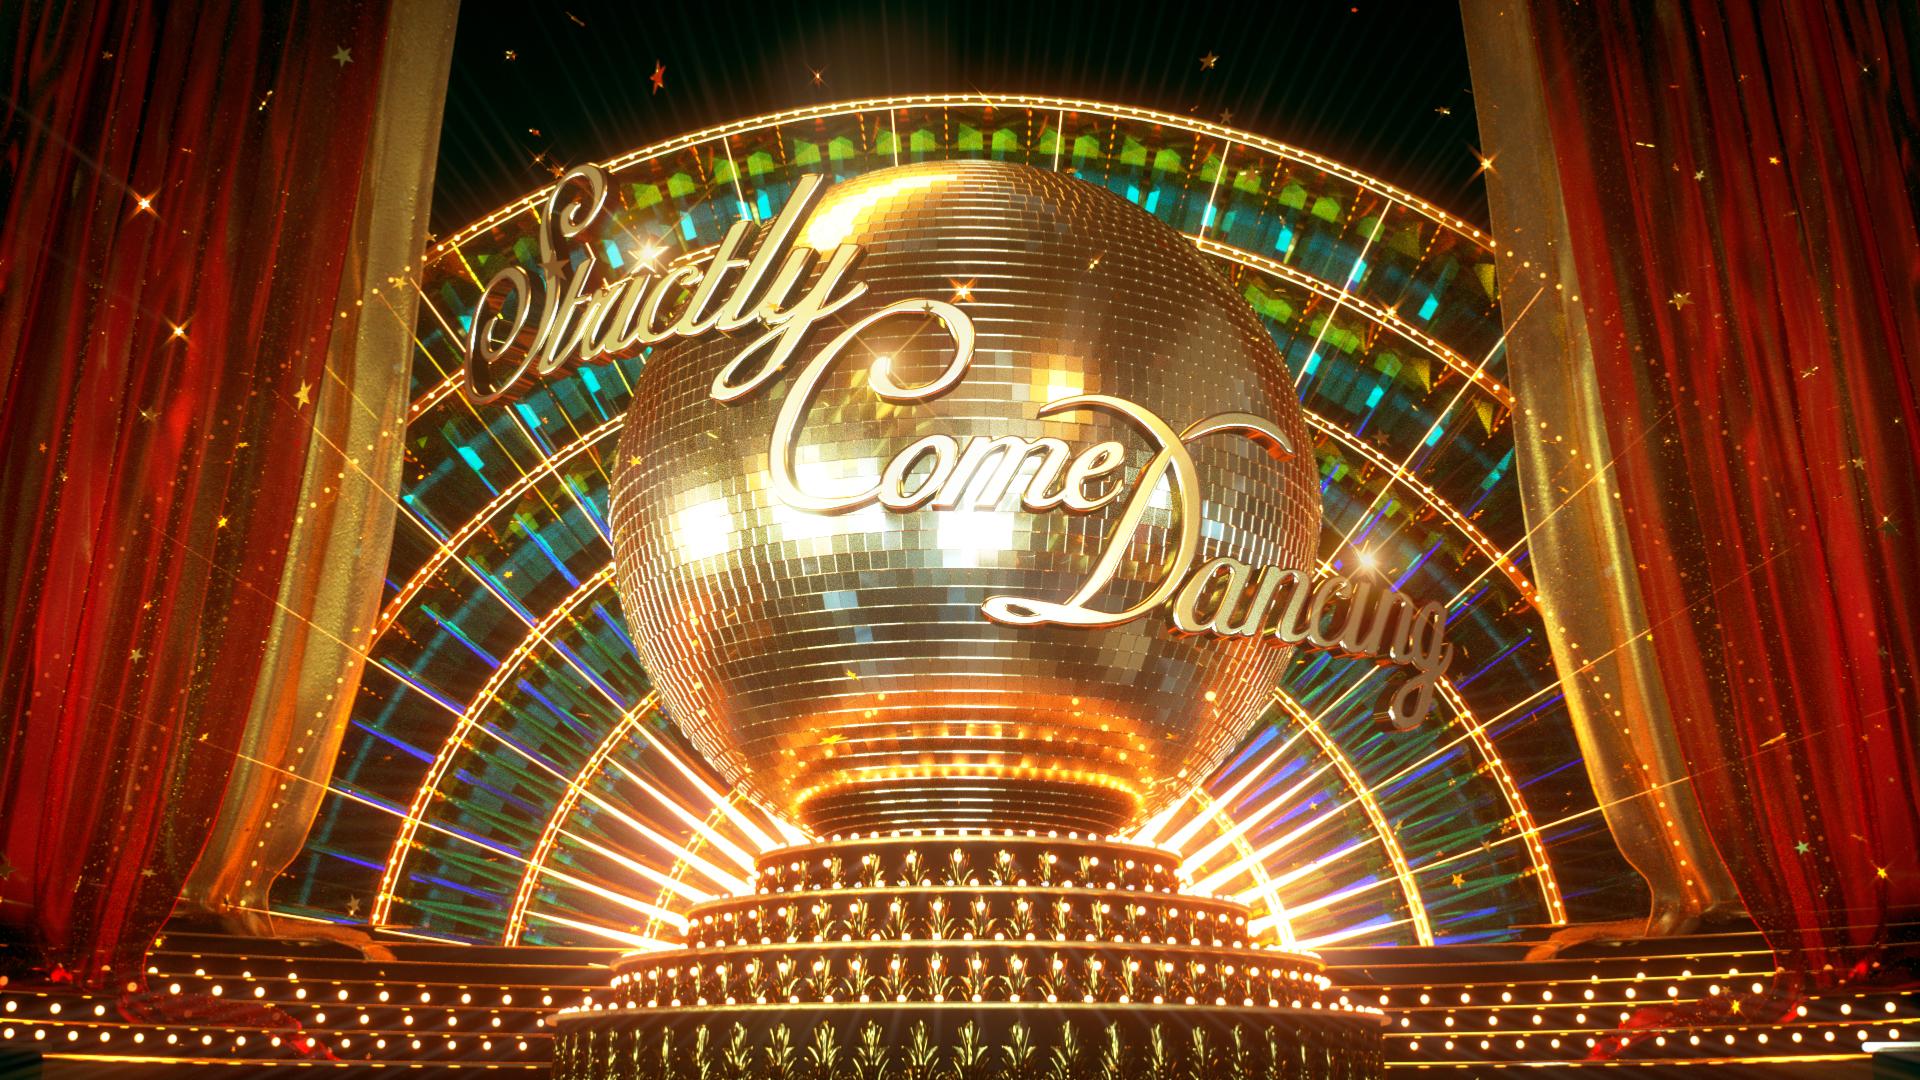 Celebrity cruises logo 2019 silverado